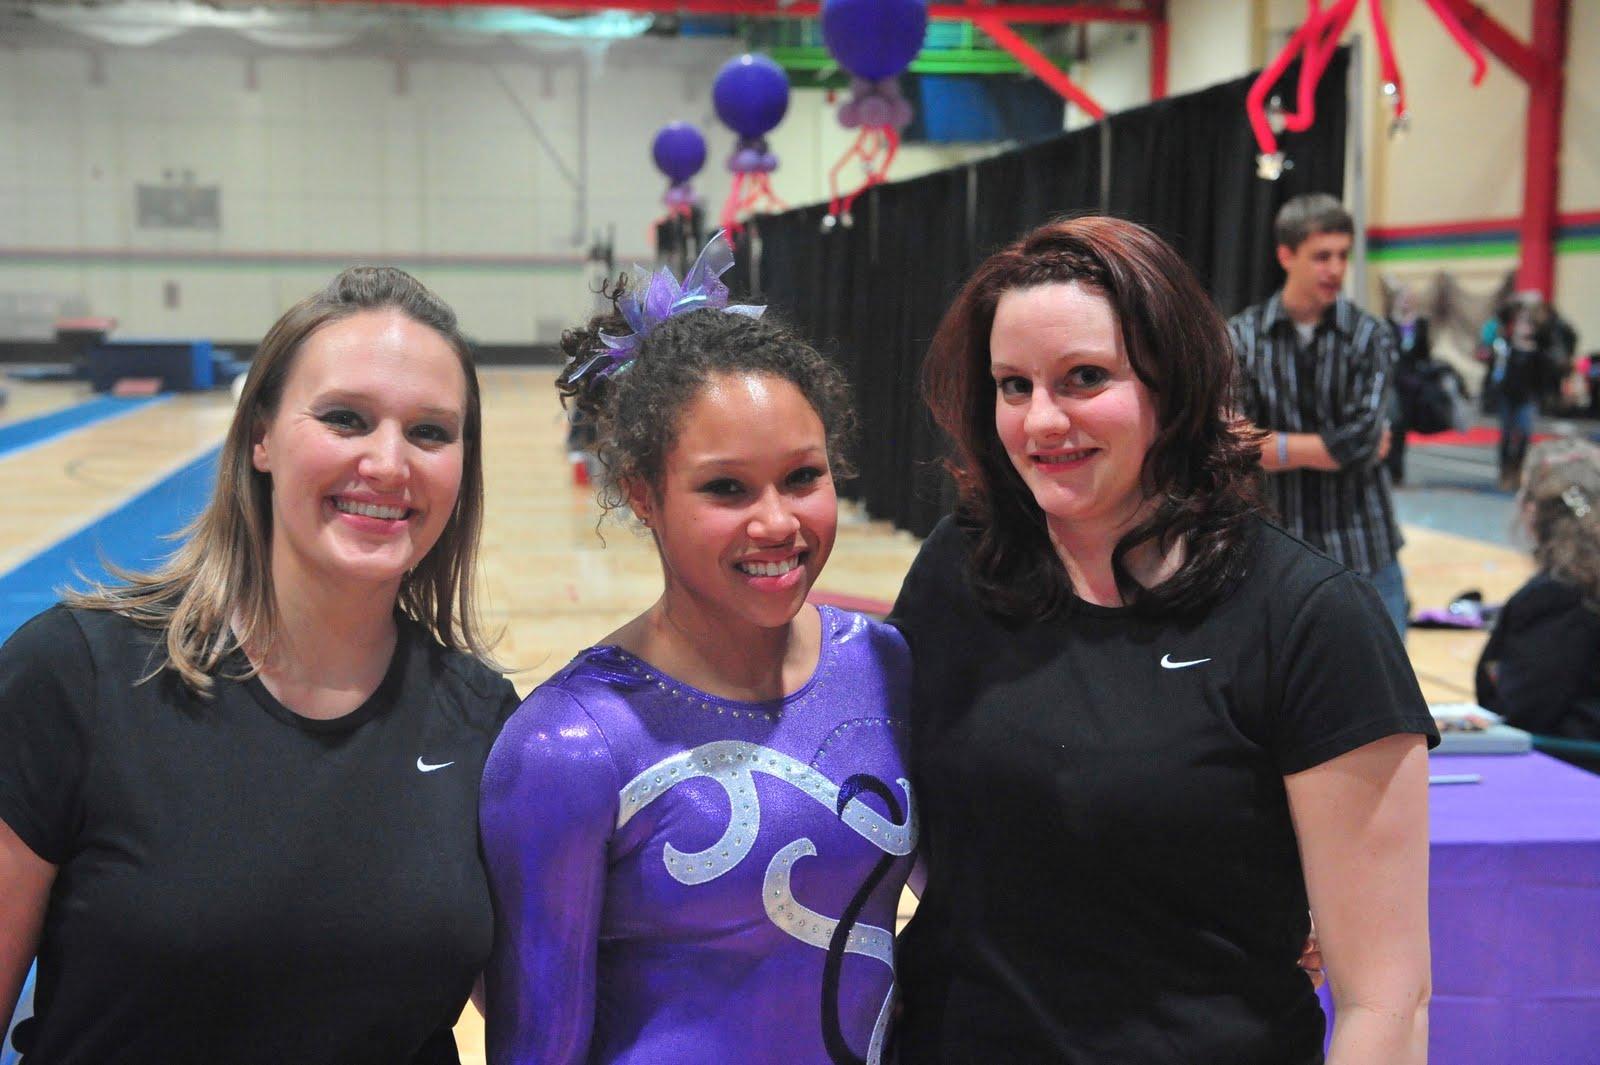 Folger S Gymnastics National Champion